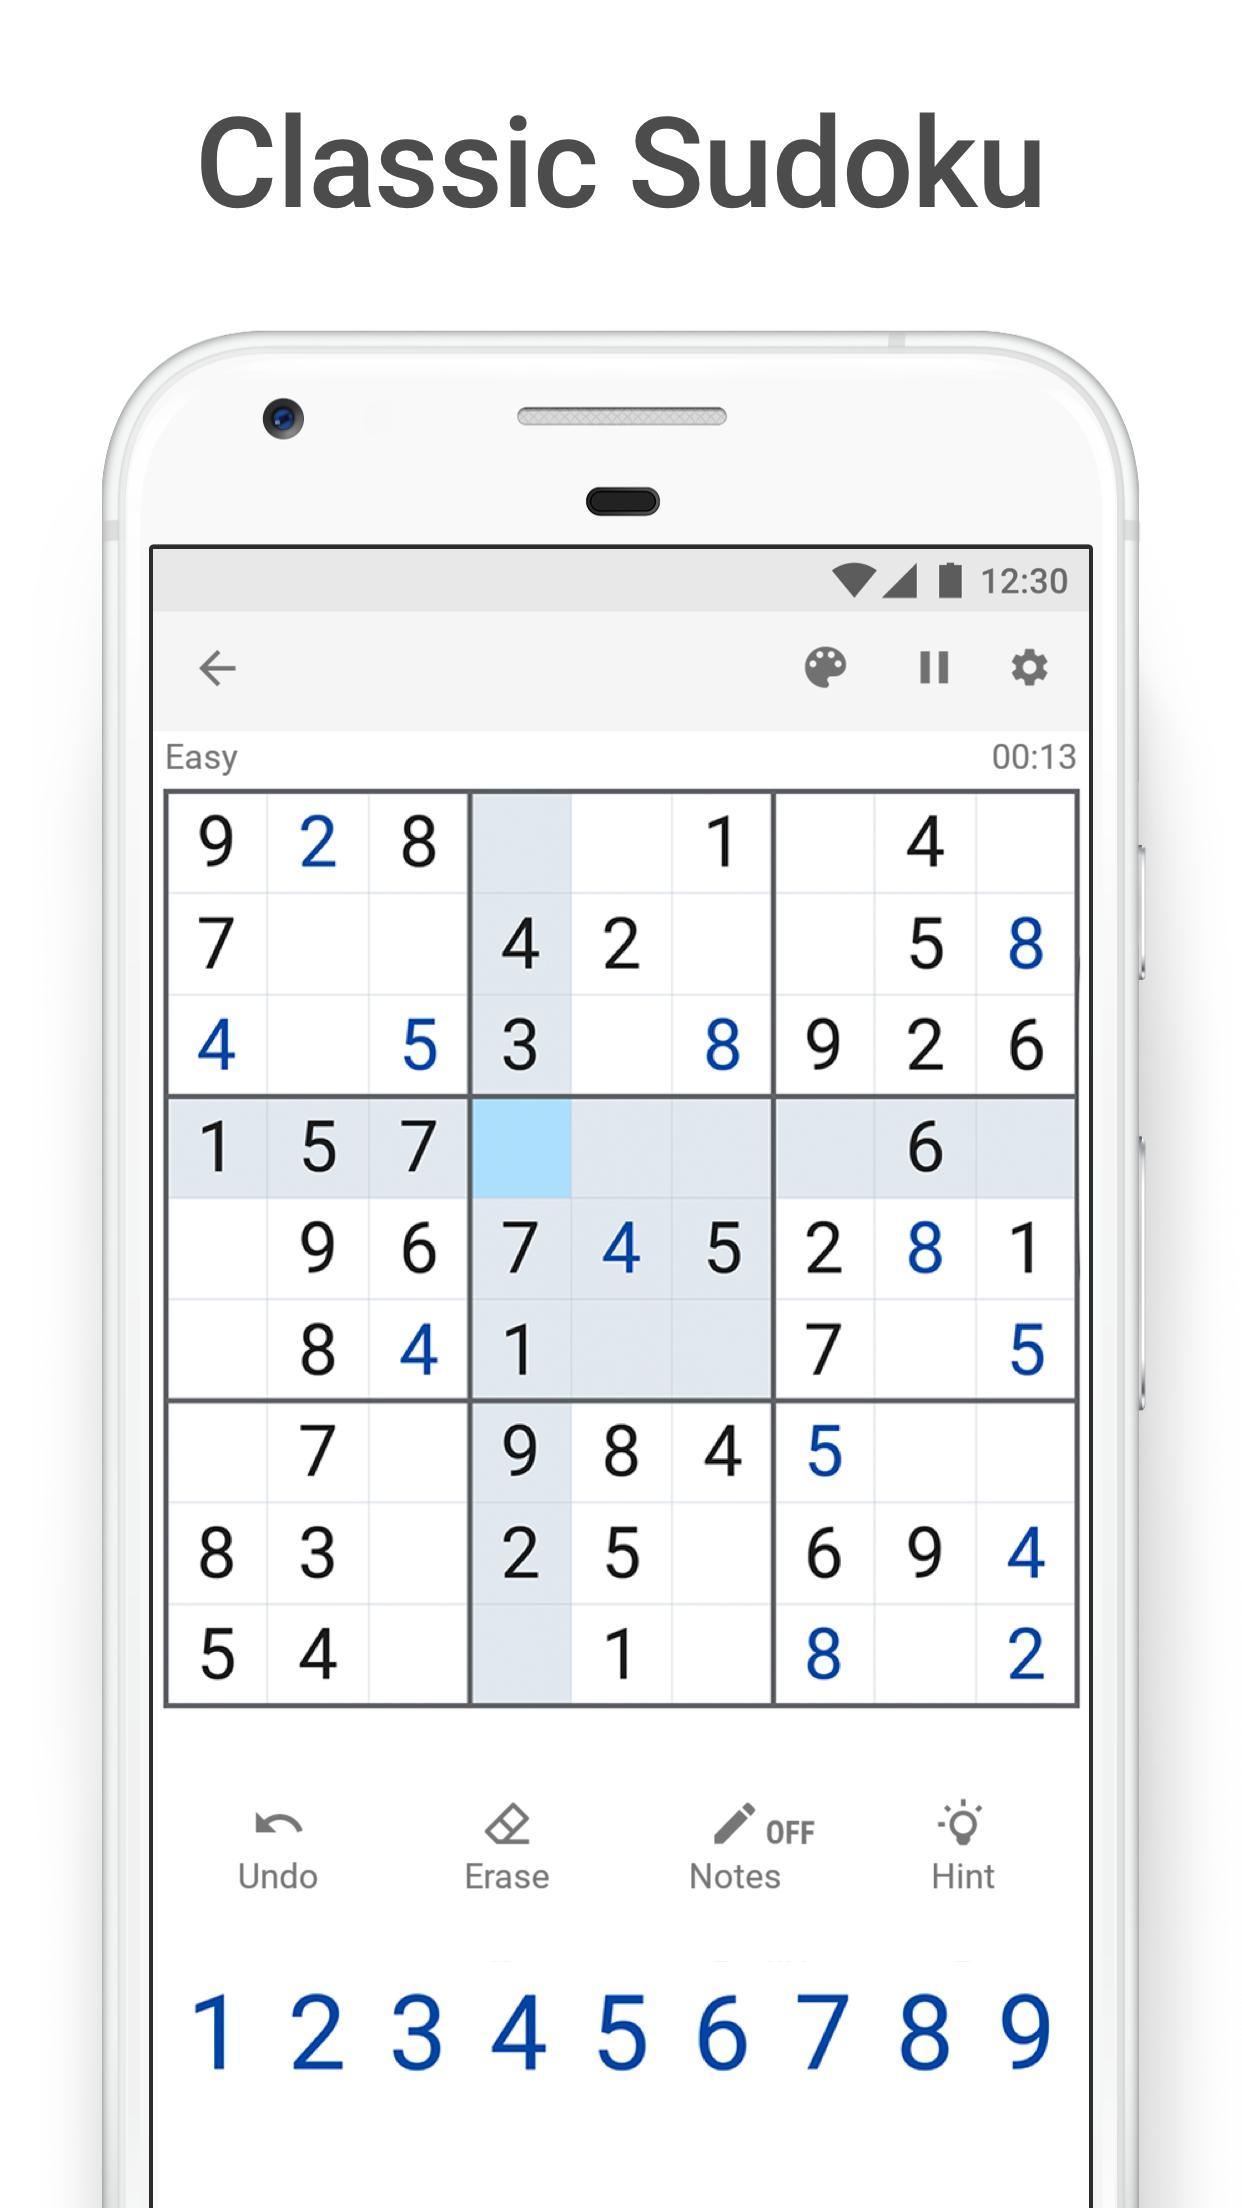 Sudoku - Free Sudoku Puzzles For Android - Apk Download concernant Telecharger Sudoku